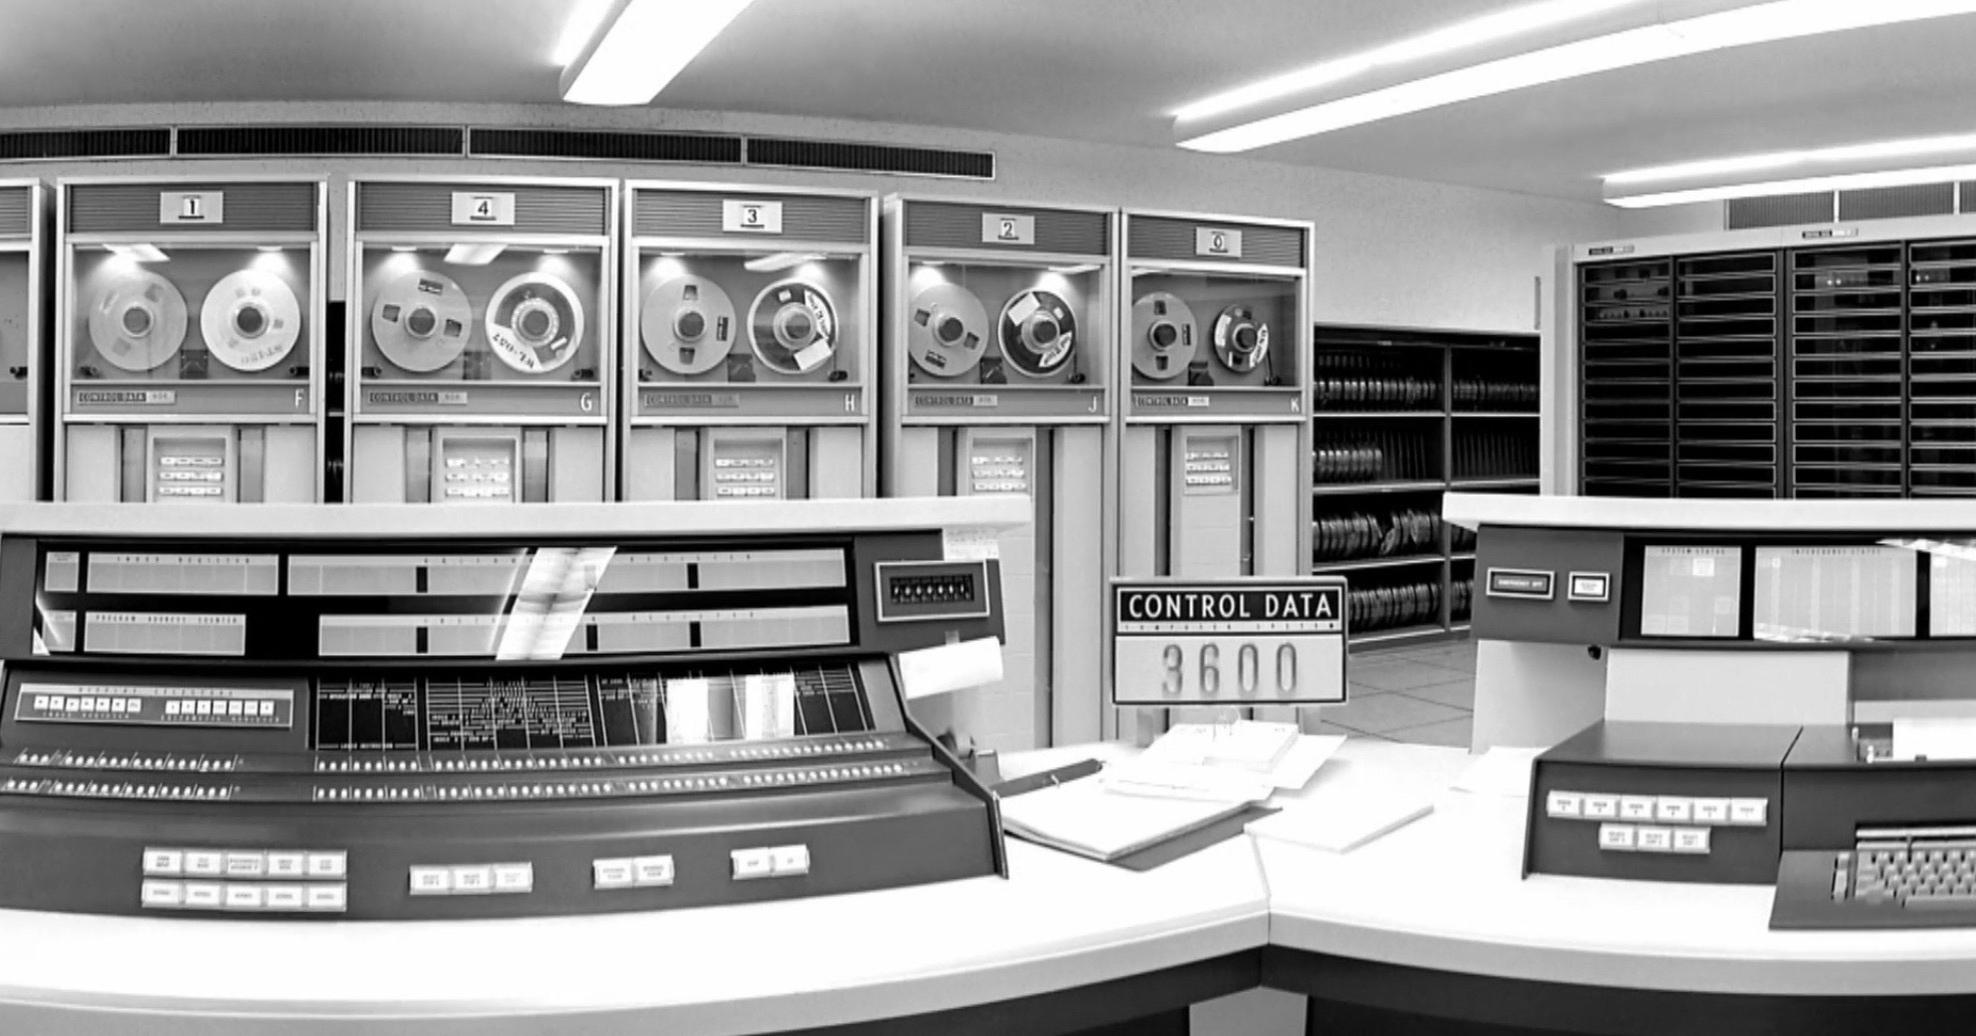 Mainframe computer I used for tracking spy satellites